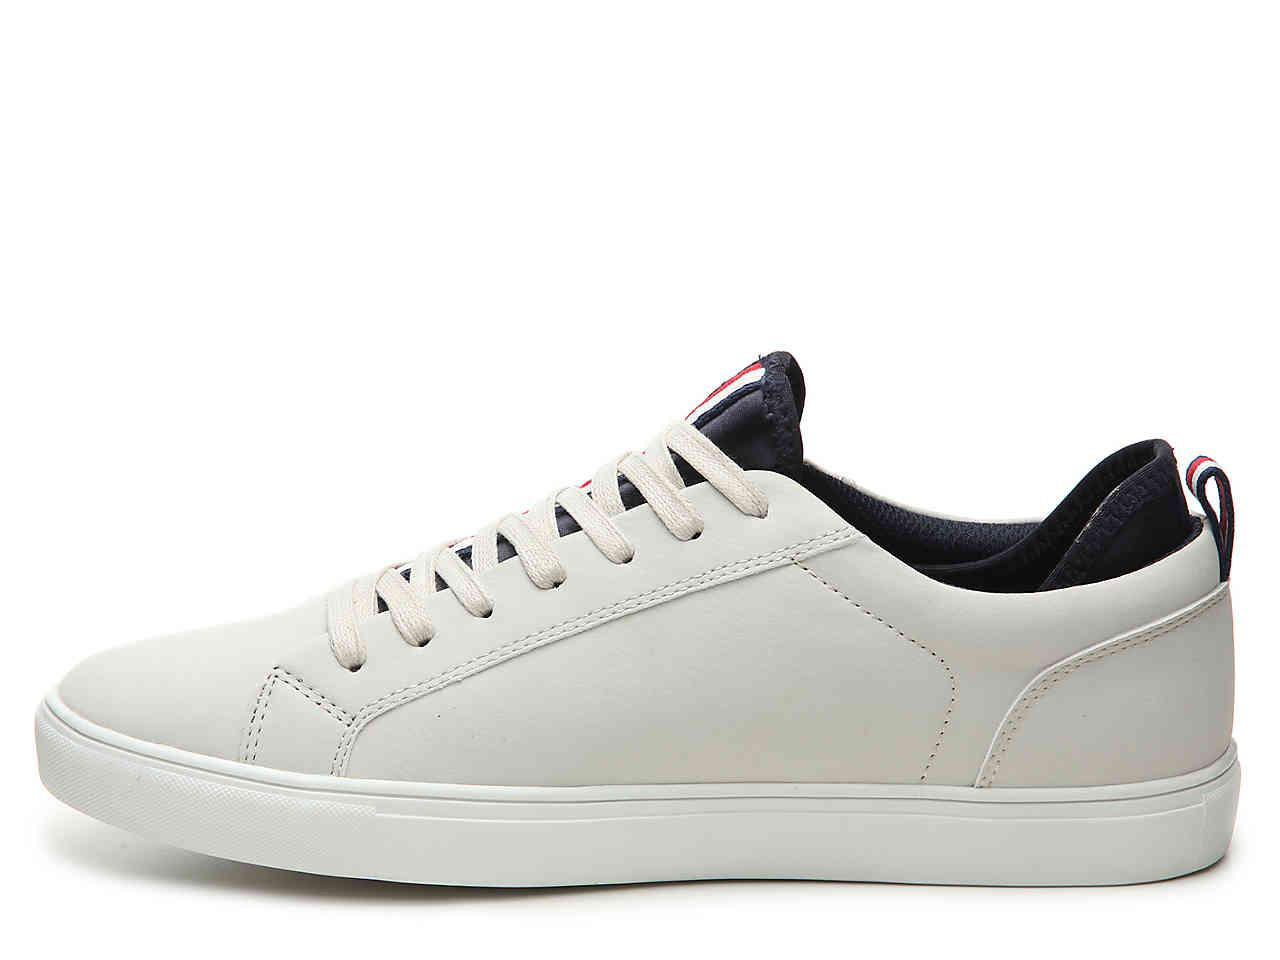 e4e0d975102d8 Lyst - Tommy Hilfiger Mcneil Sneaker in Gray for Men